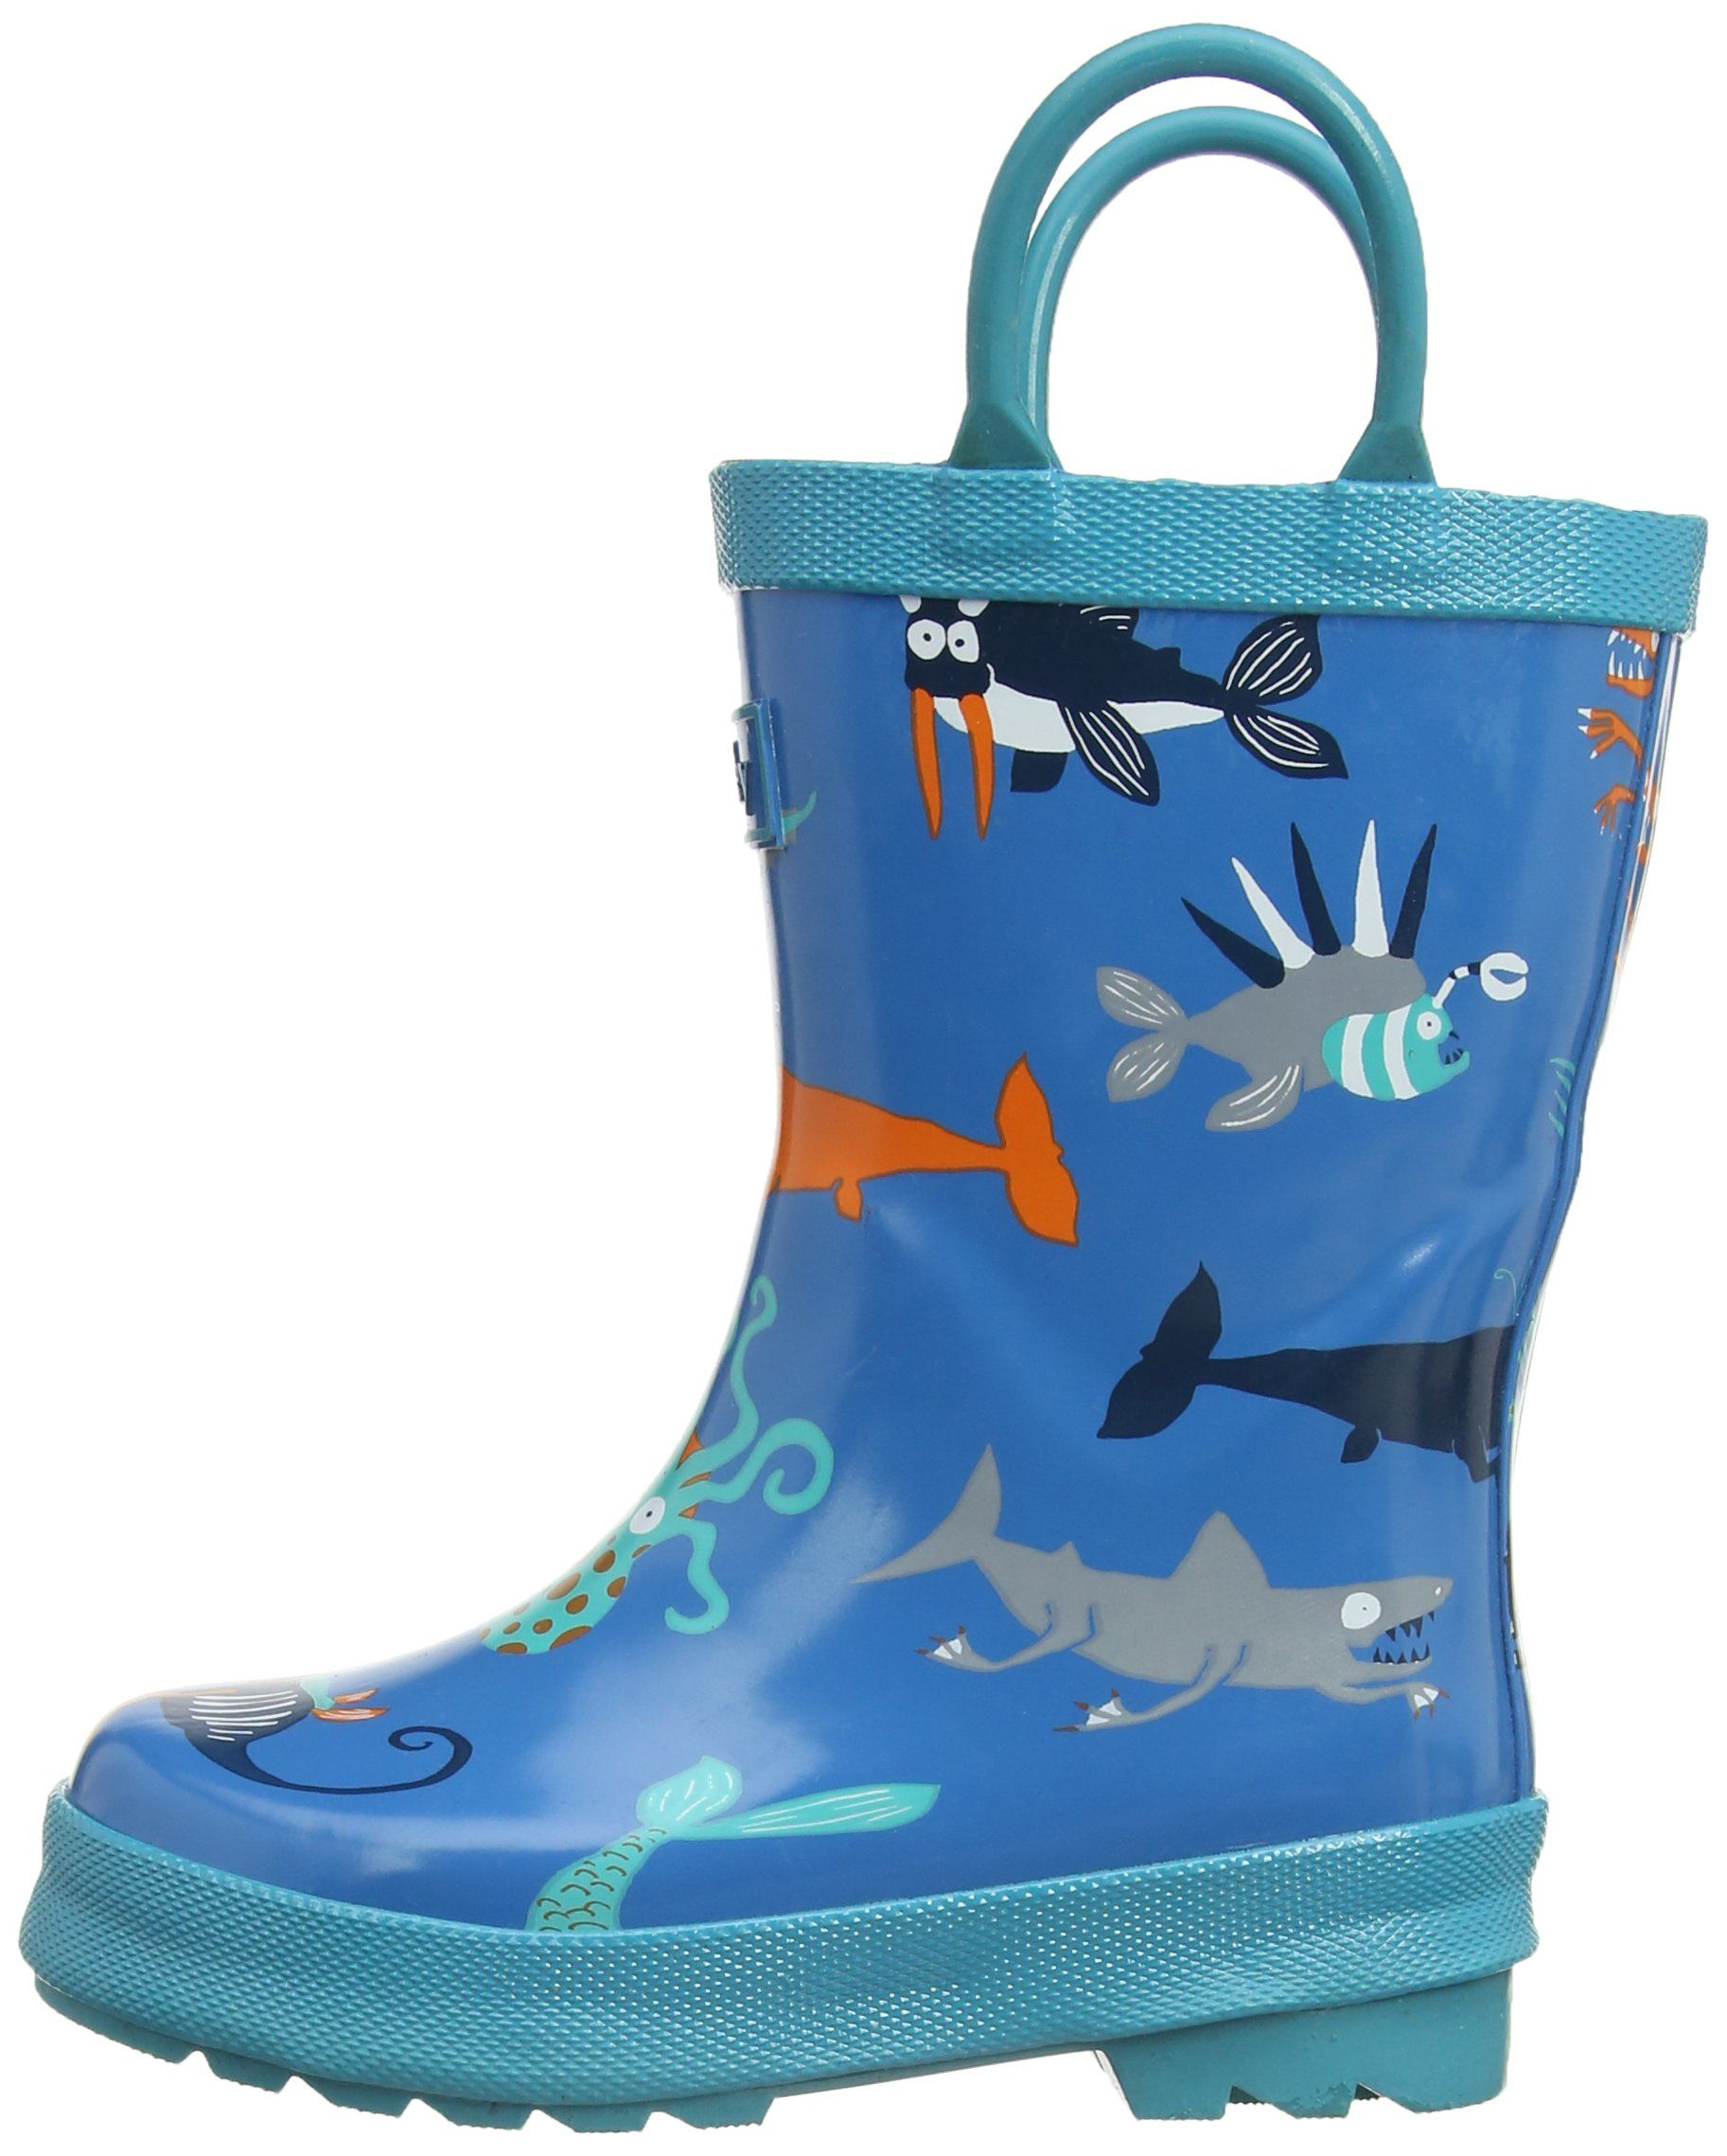 Hatley Big Boys' Rainboots -Sea Creatures, Blue, 10